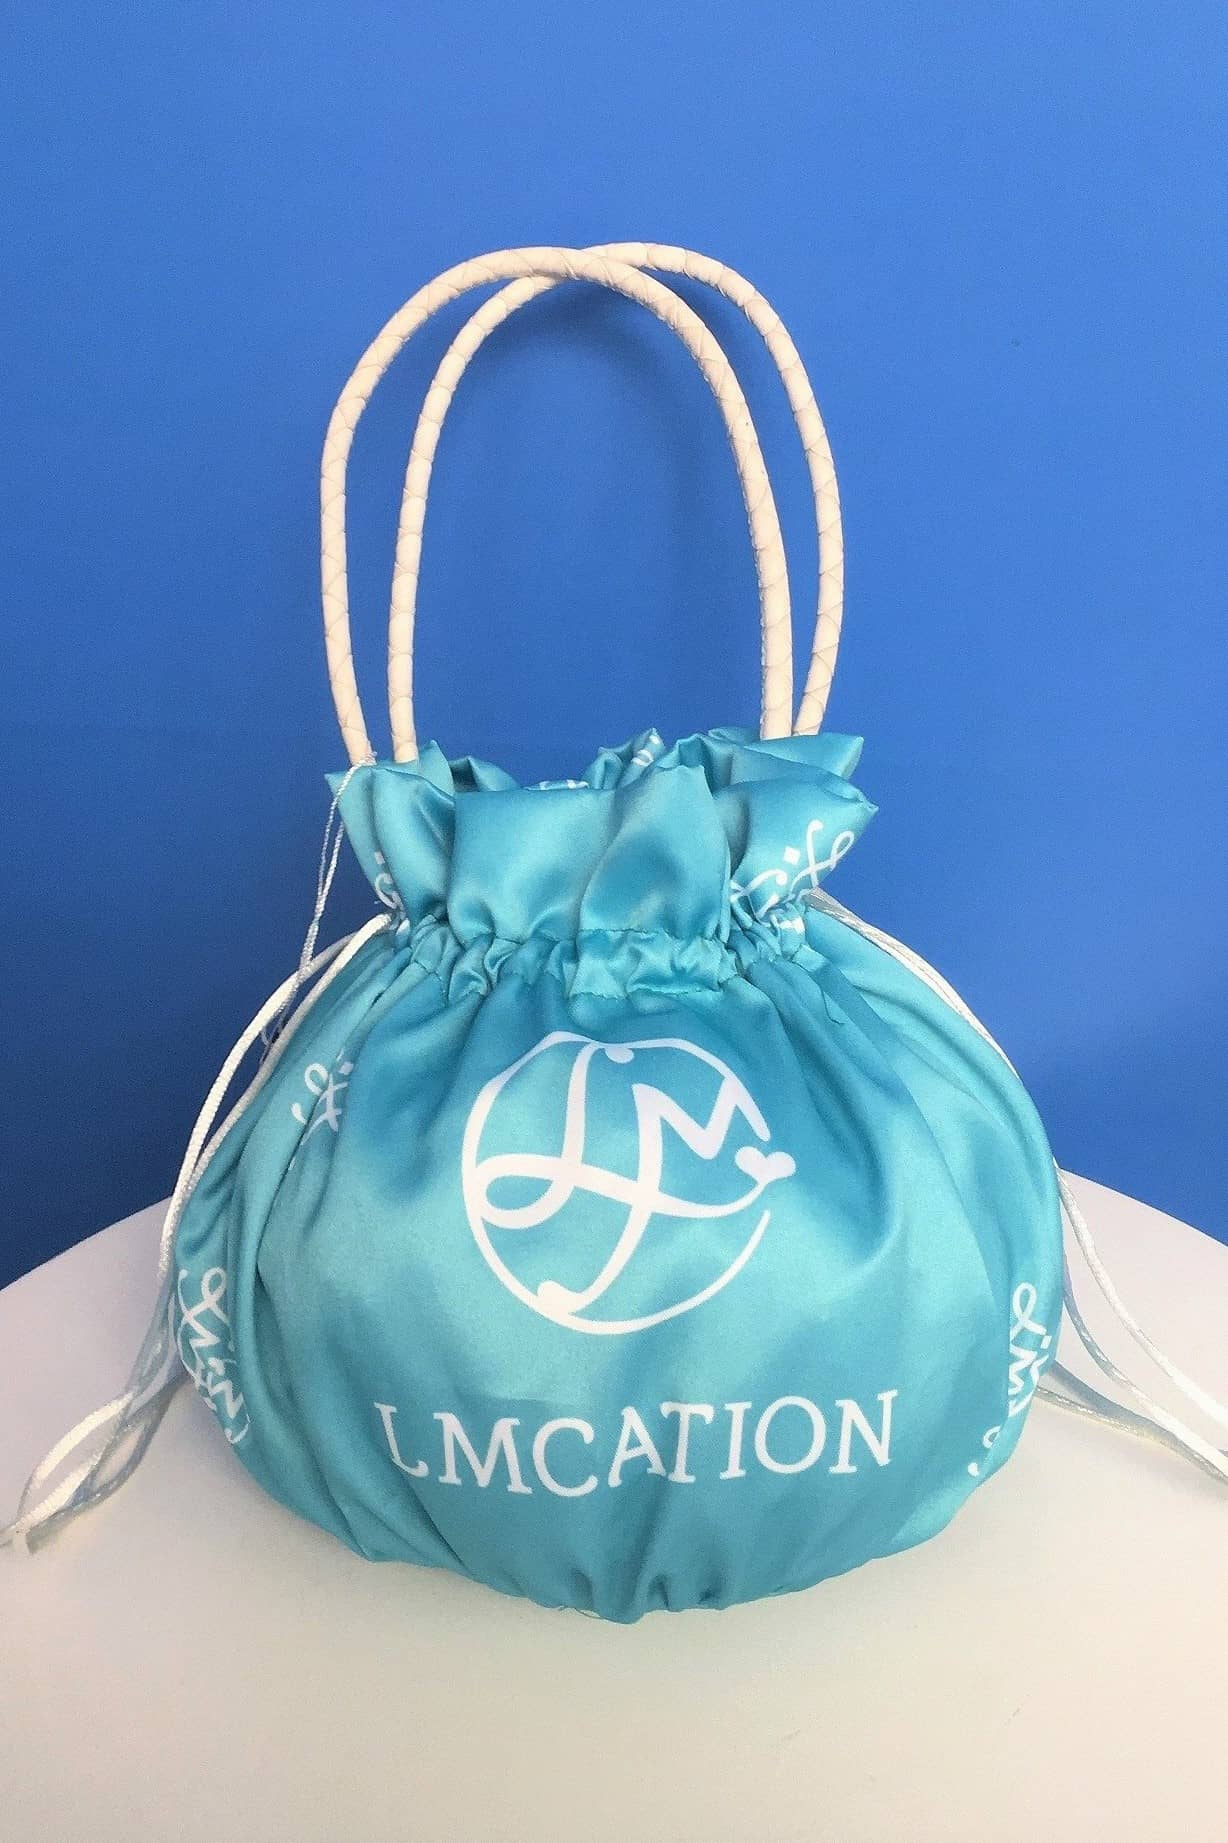 LMcation Beach Bag - Blue